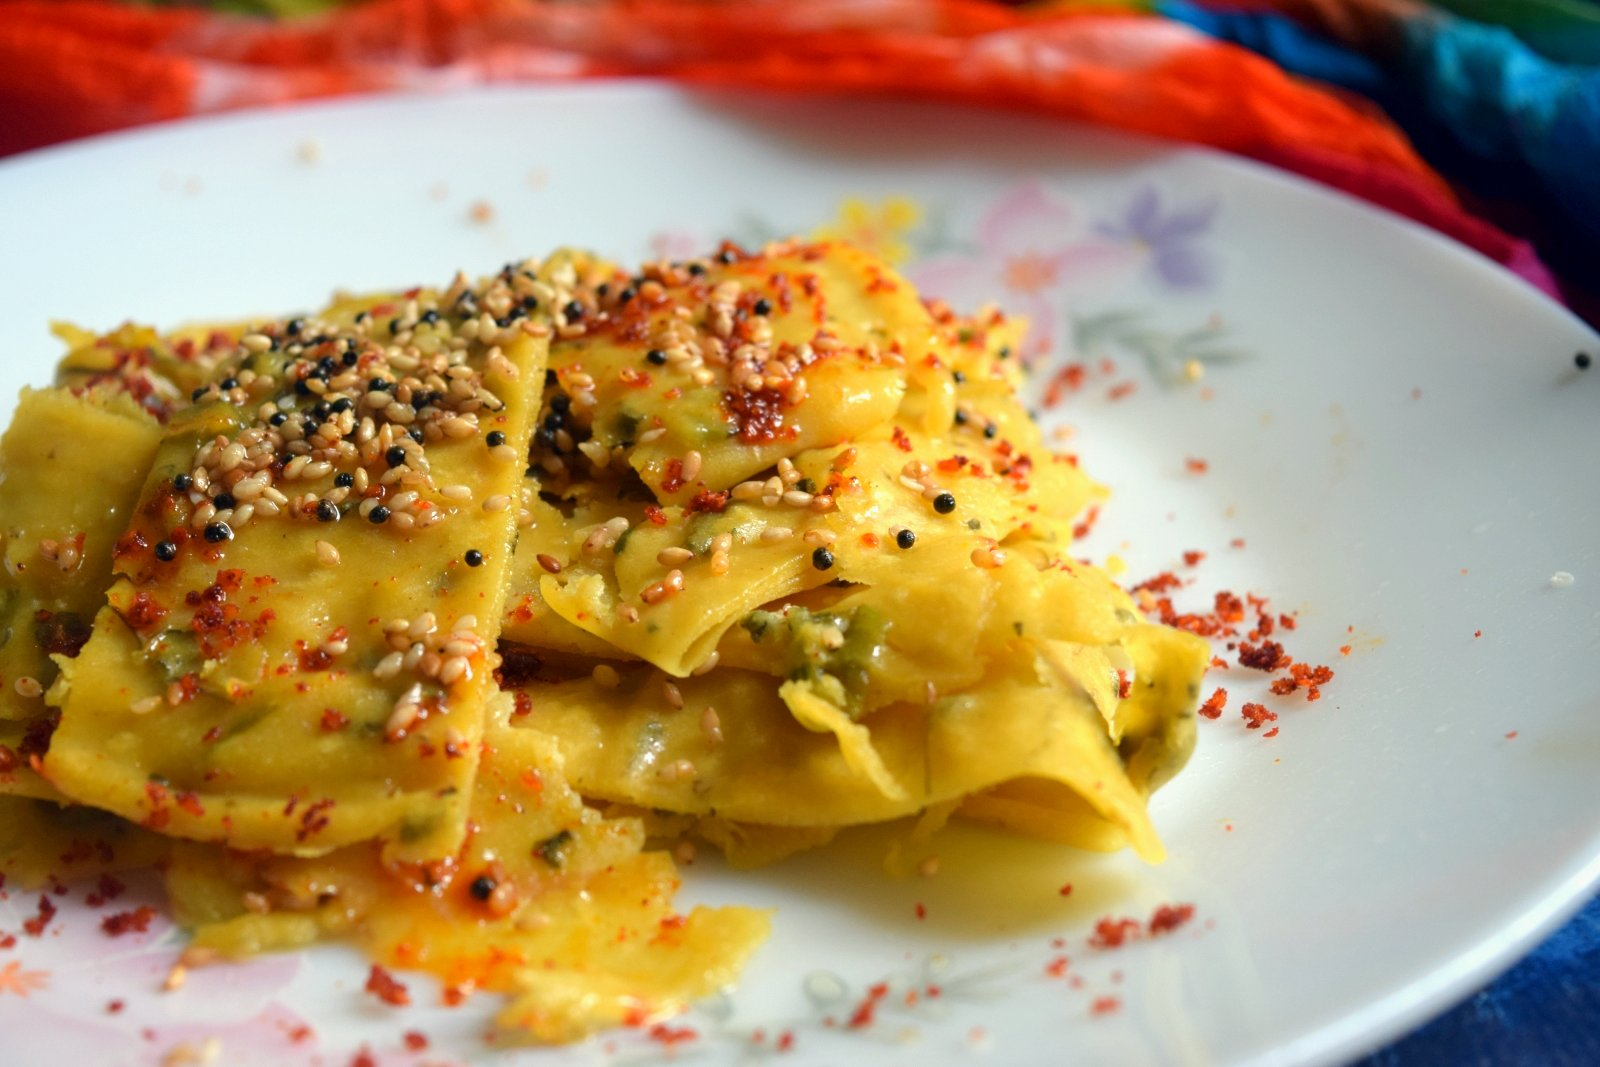 Chiba dhokli recipe gujarati snack with besan by archanas kitchen chiba dhokli recipe gujarati snack with besan forumfinder Choice Image